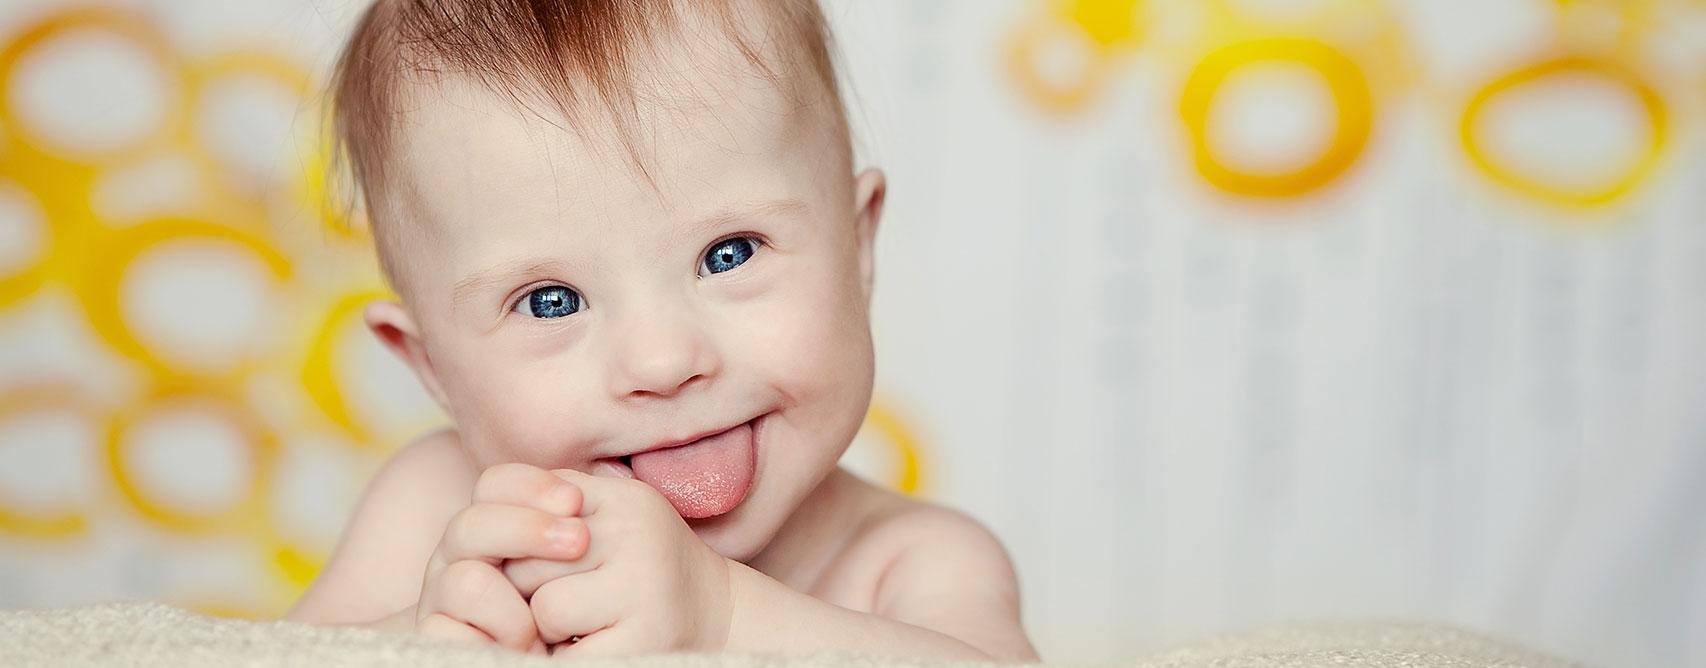 Toronto Family Doulas - Baby